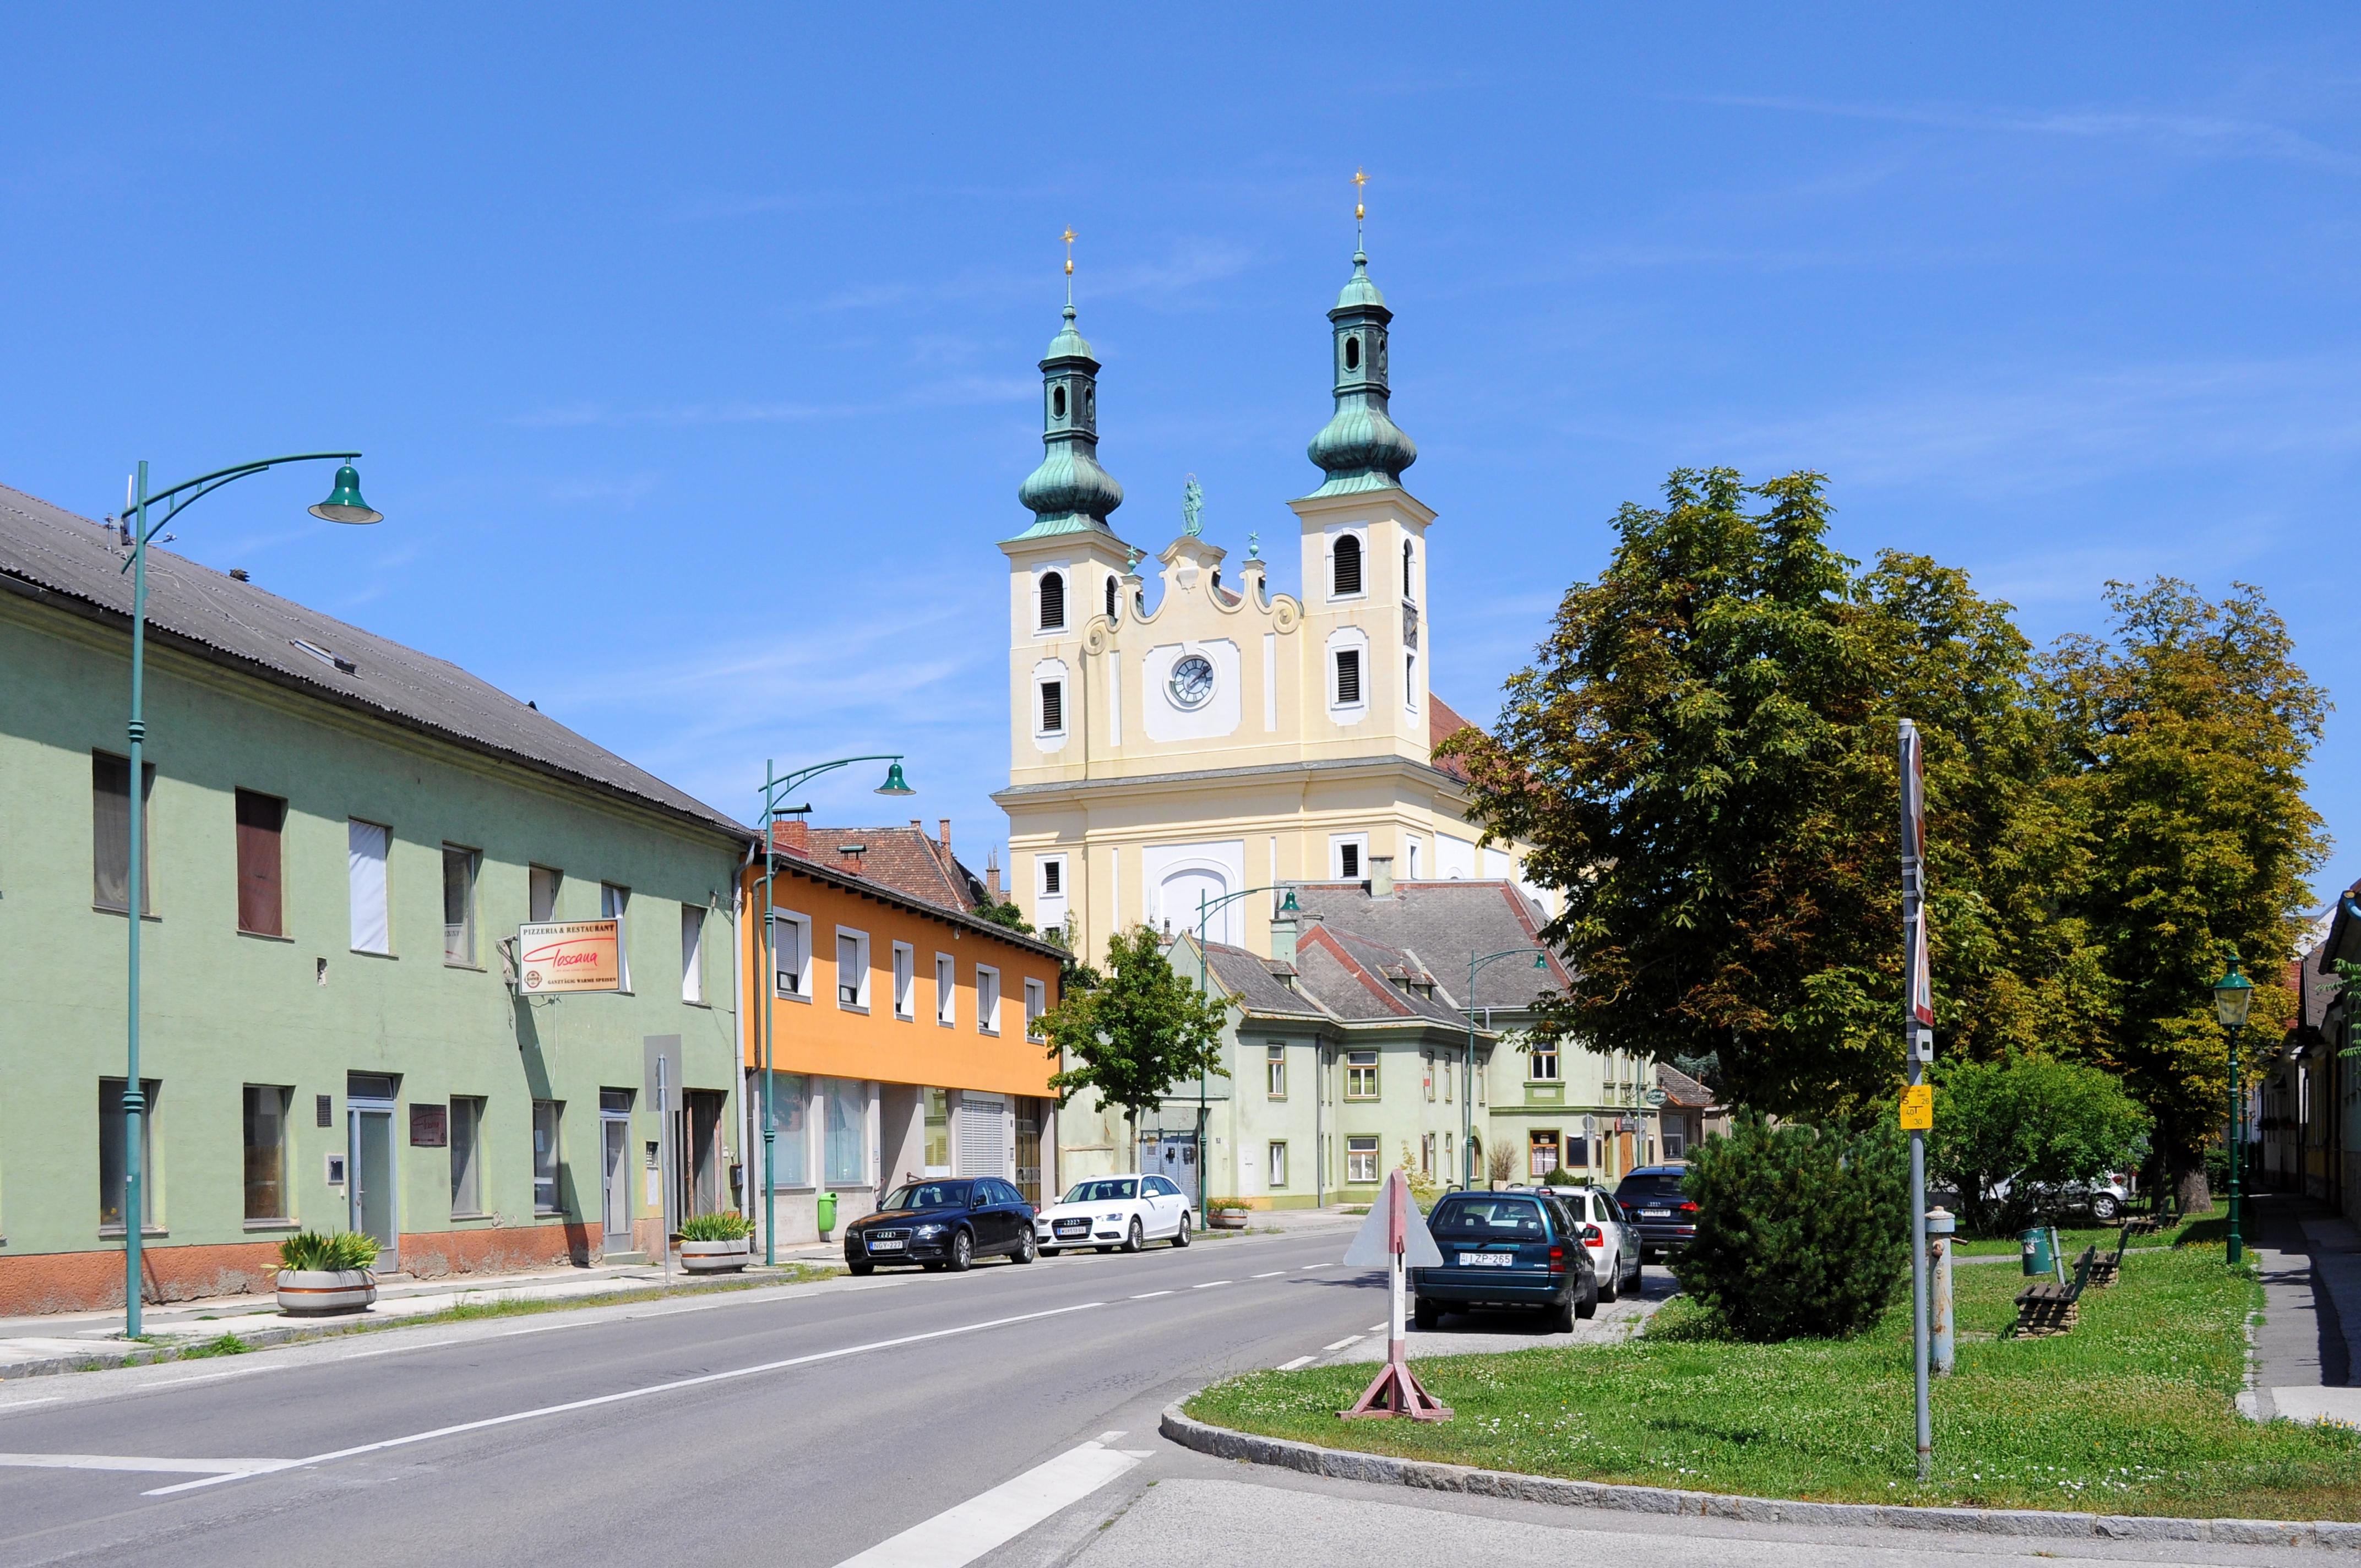 Maria-Lanzendorf, Austria Networking Events | Eventbrite